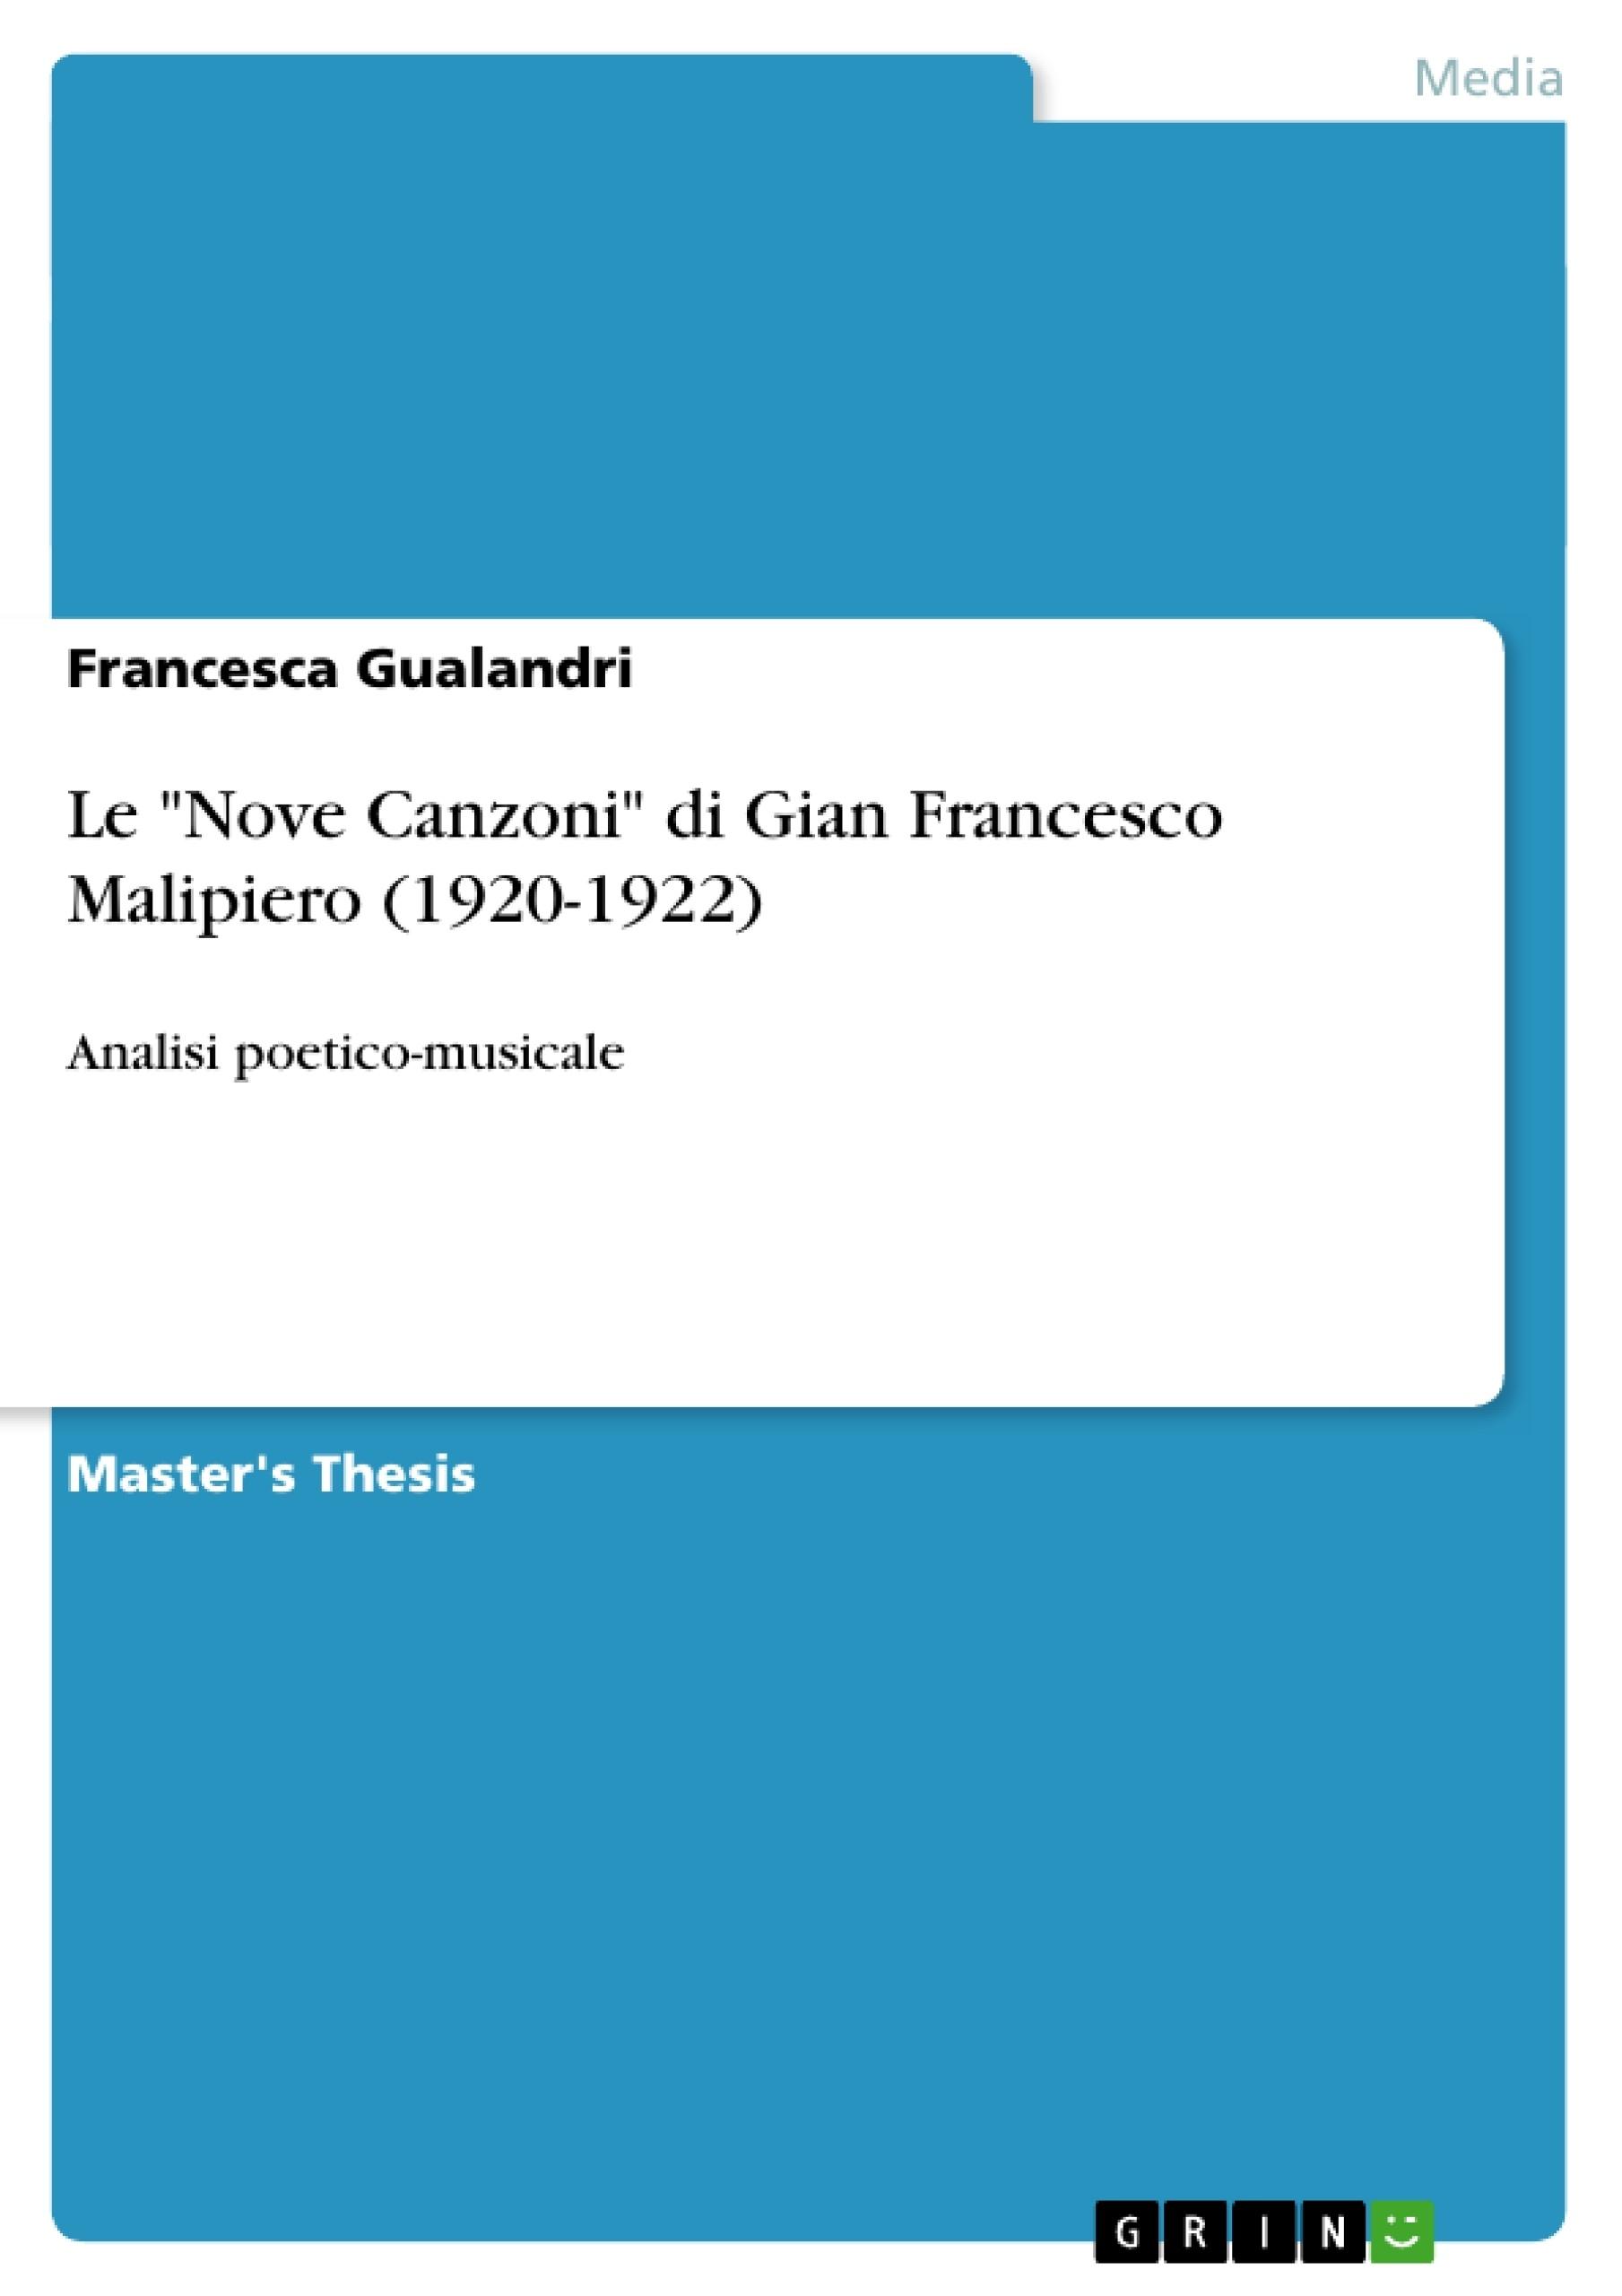 "Title: Le ""Nove Canzoni"" di Gian Francesco Malipiero (1920-1922)"